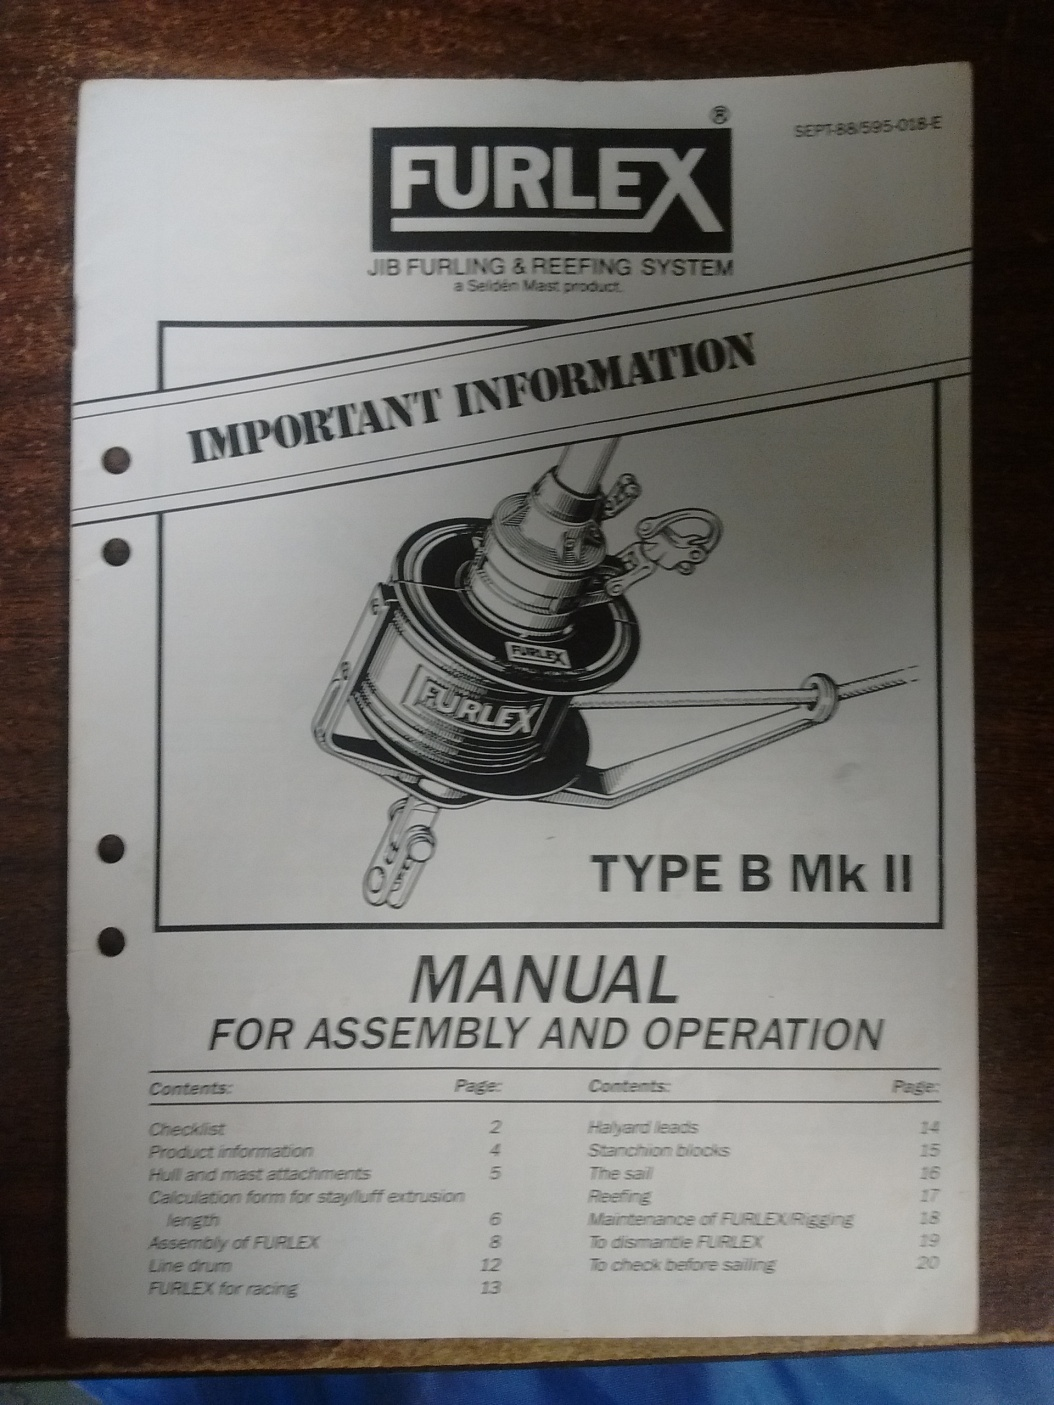 SOLD] Furlex Type B Mk II Roller Furler - Cruisers & Sailing Forums